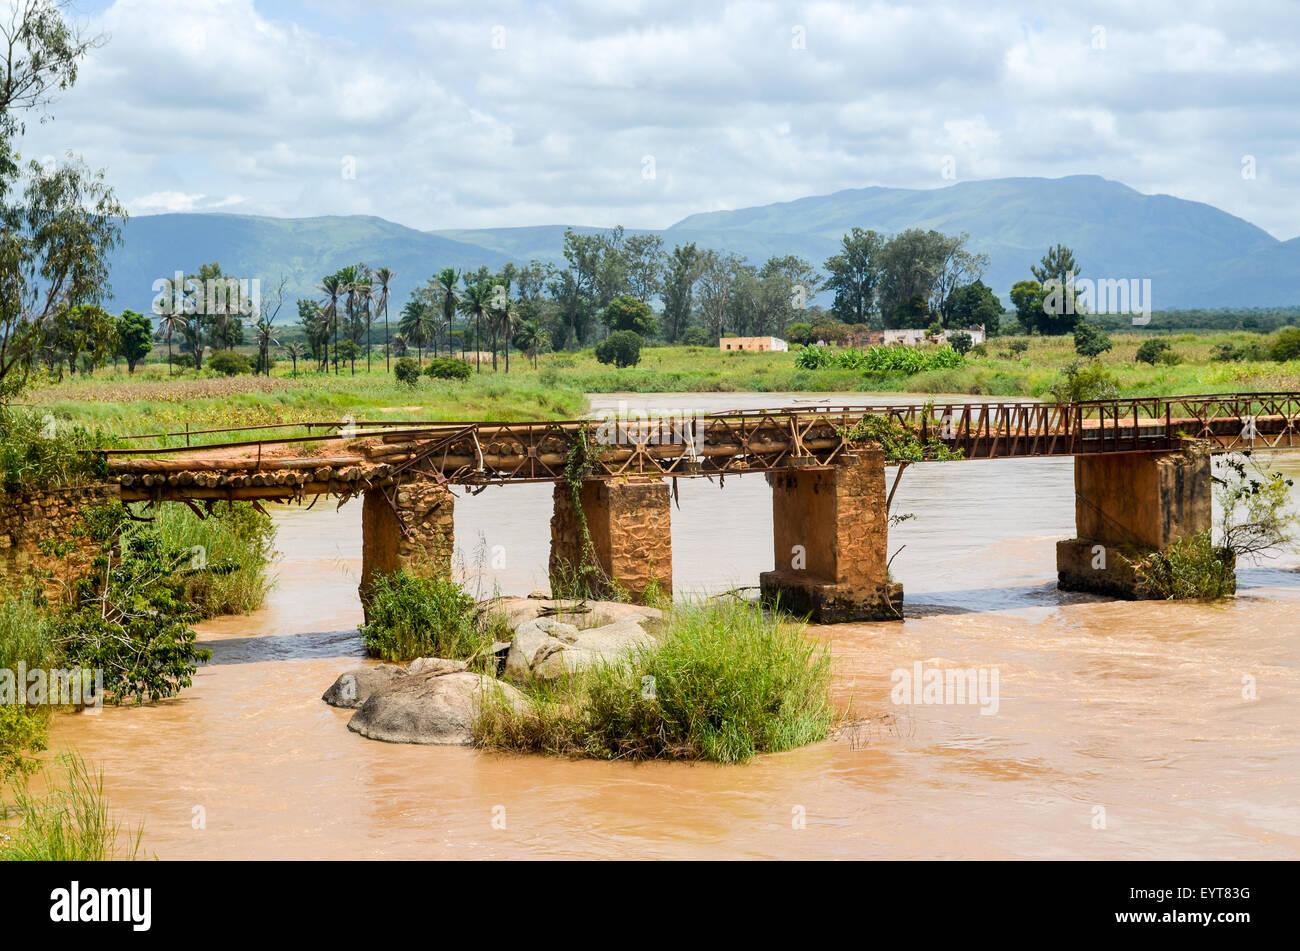 Ruins of a bridge in rural Angola, Benguela province - Stock Image